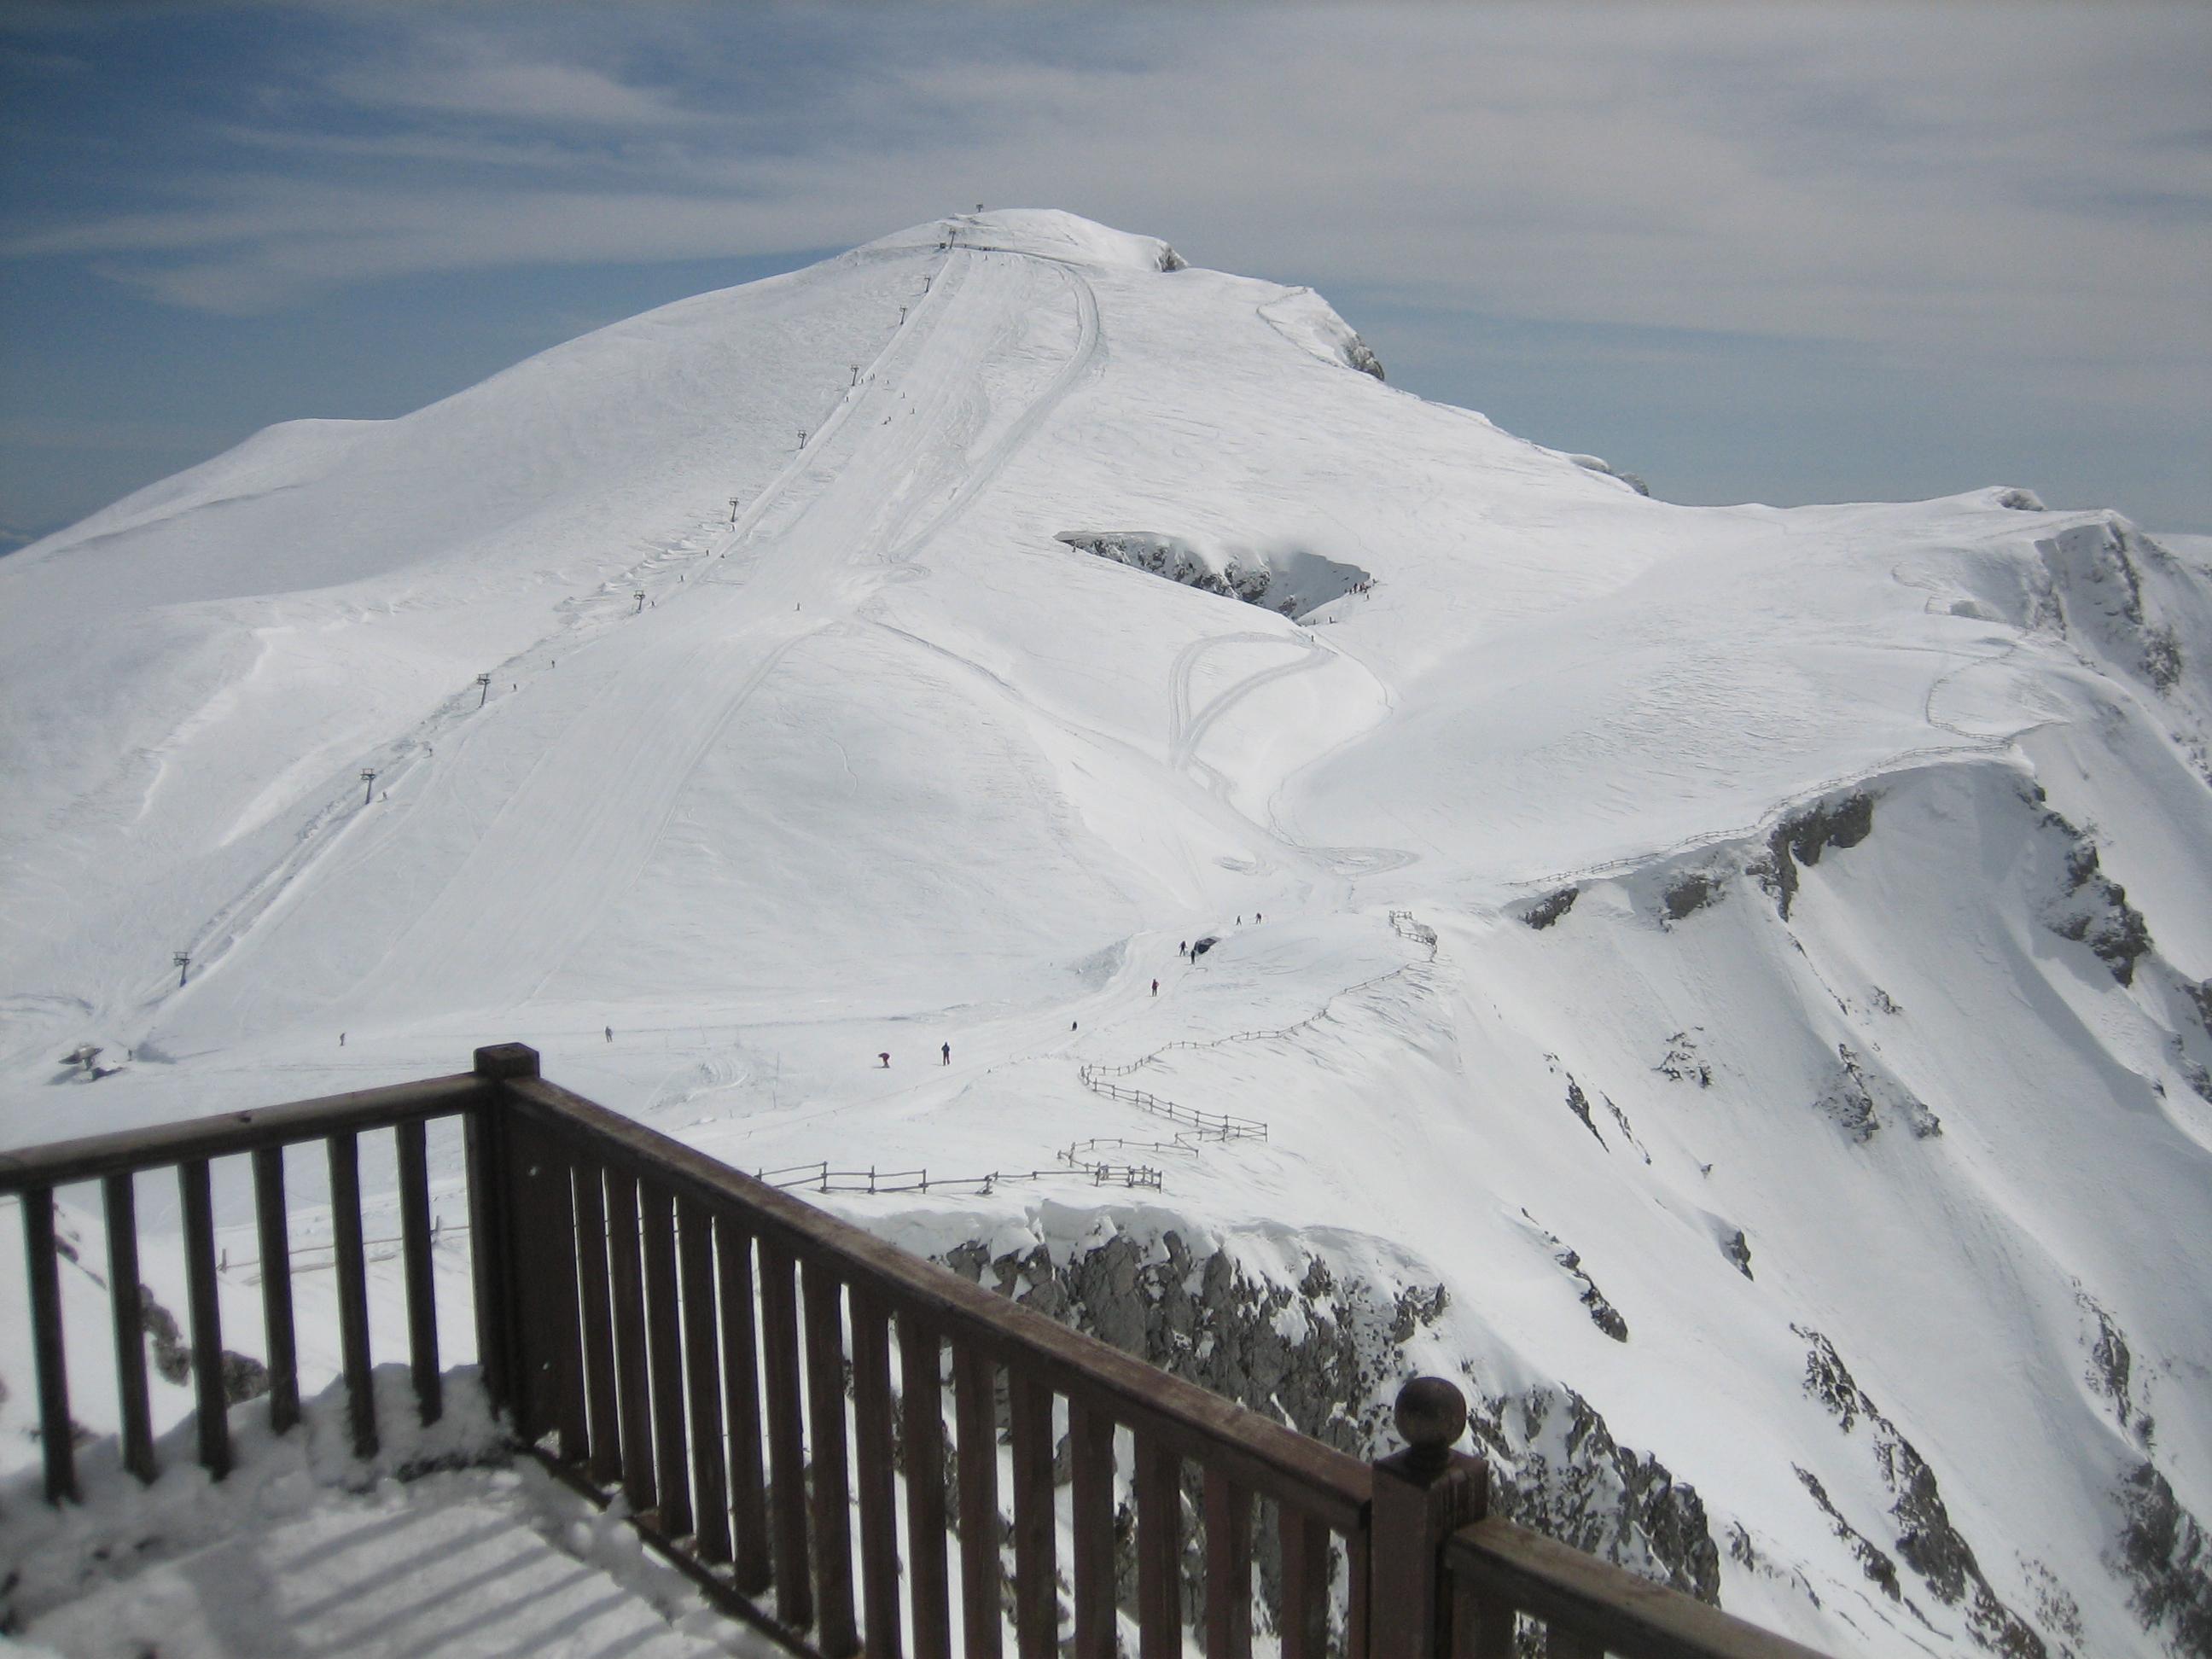 "Looking ""xionotripa"" pist from"" chalet on 2110m Mt.Falakro, Falakro Ski Resort"